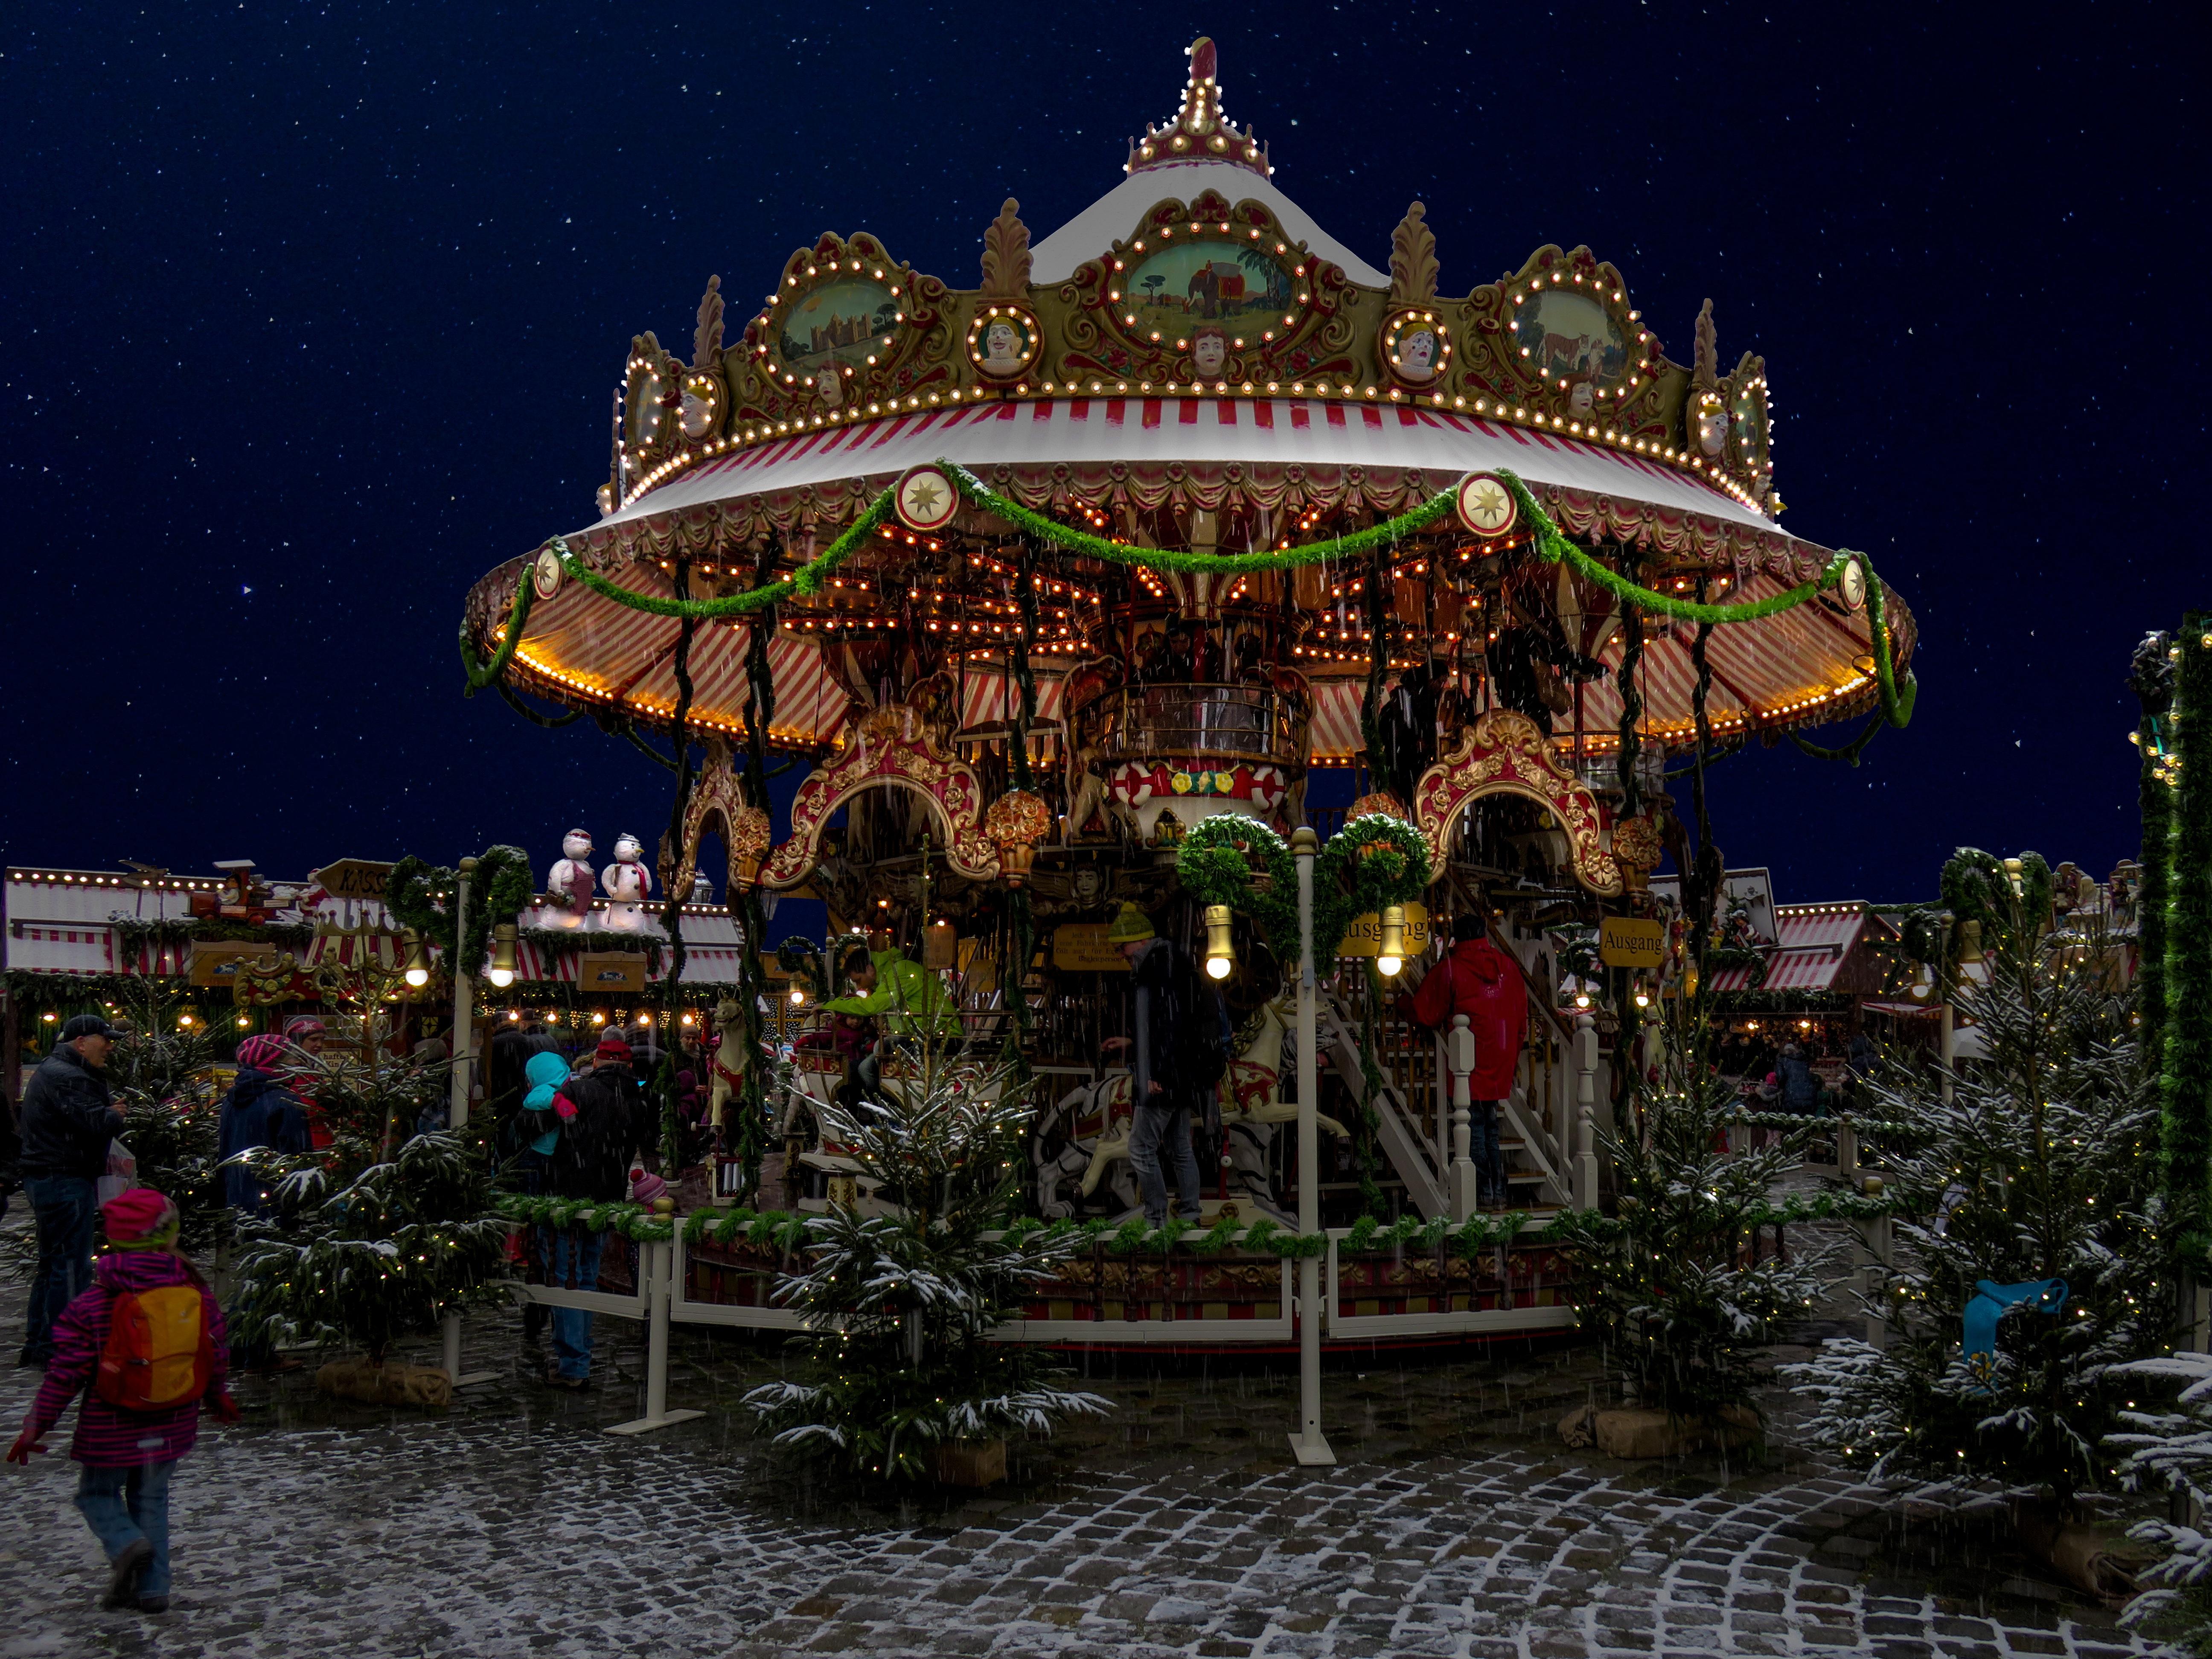 Free Images Snow Winter Light Amusement Park Carousel